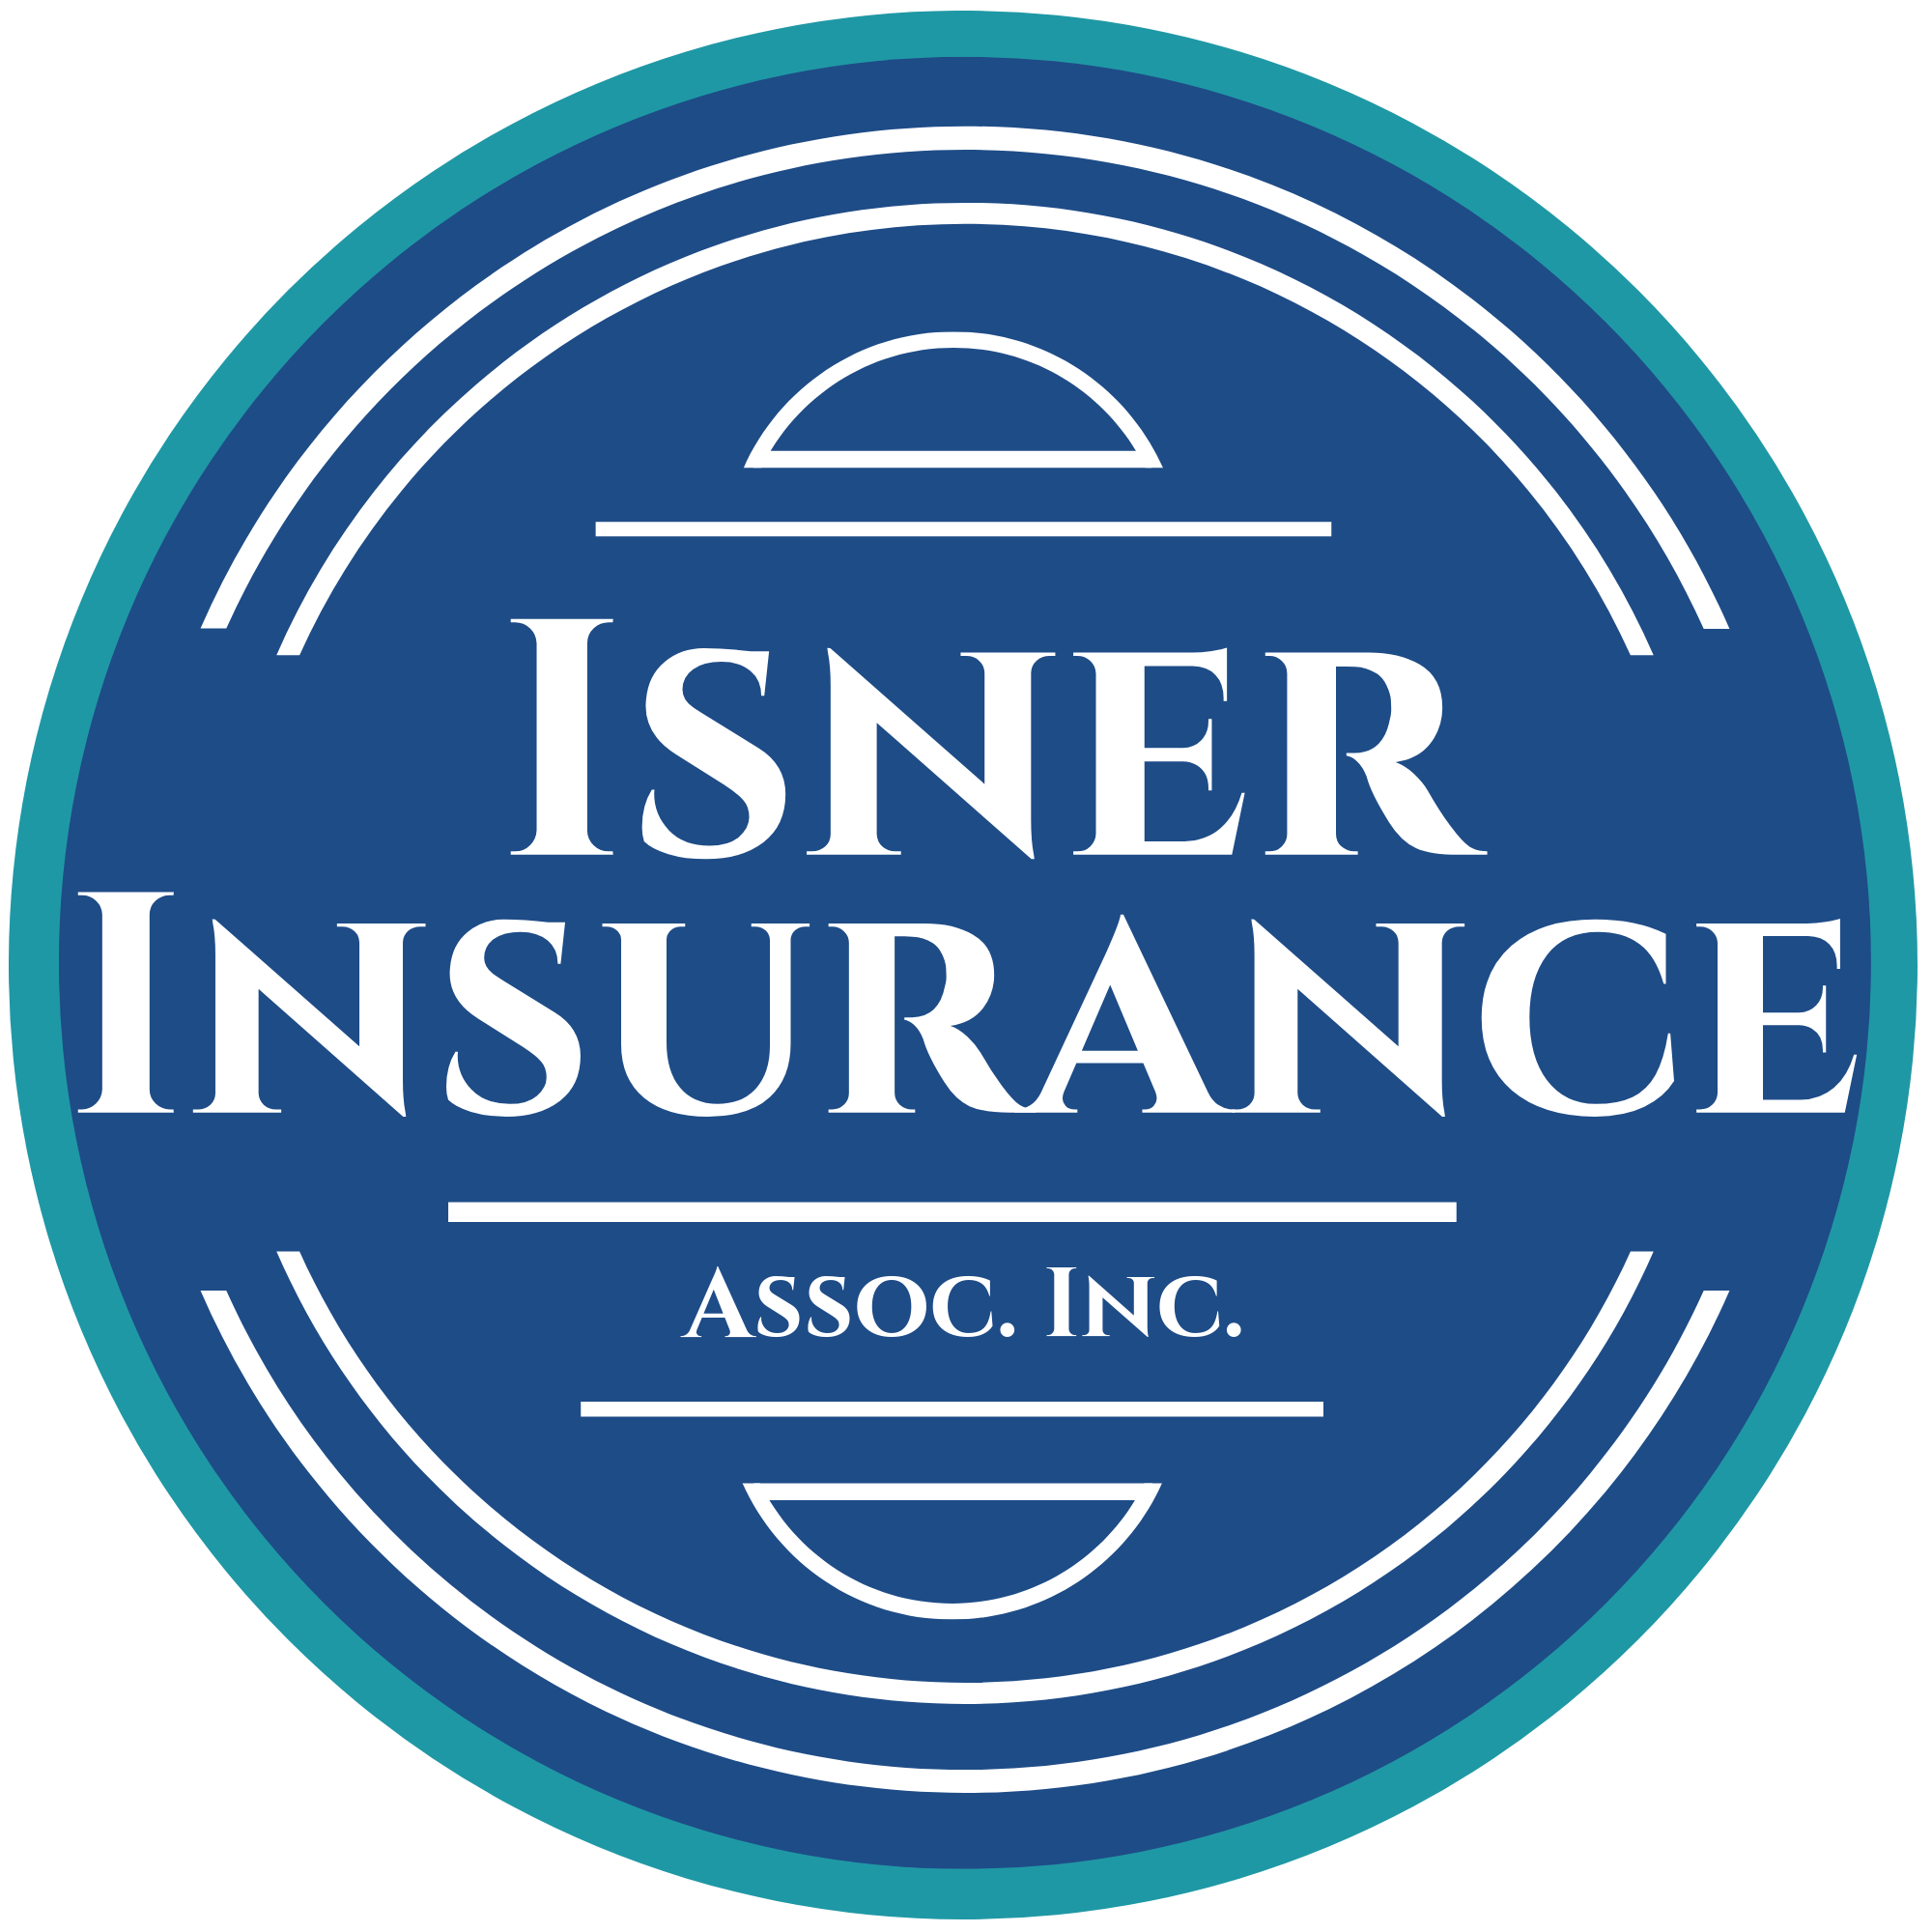 Isner Insurance Associates, Inc.